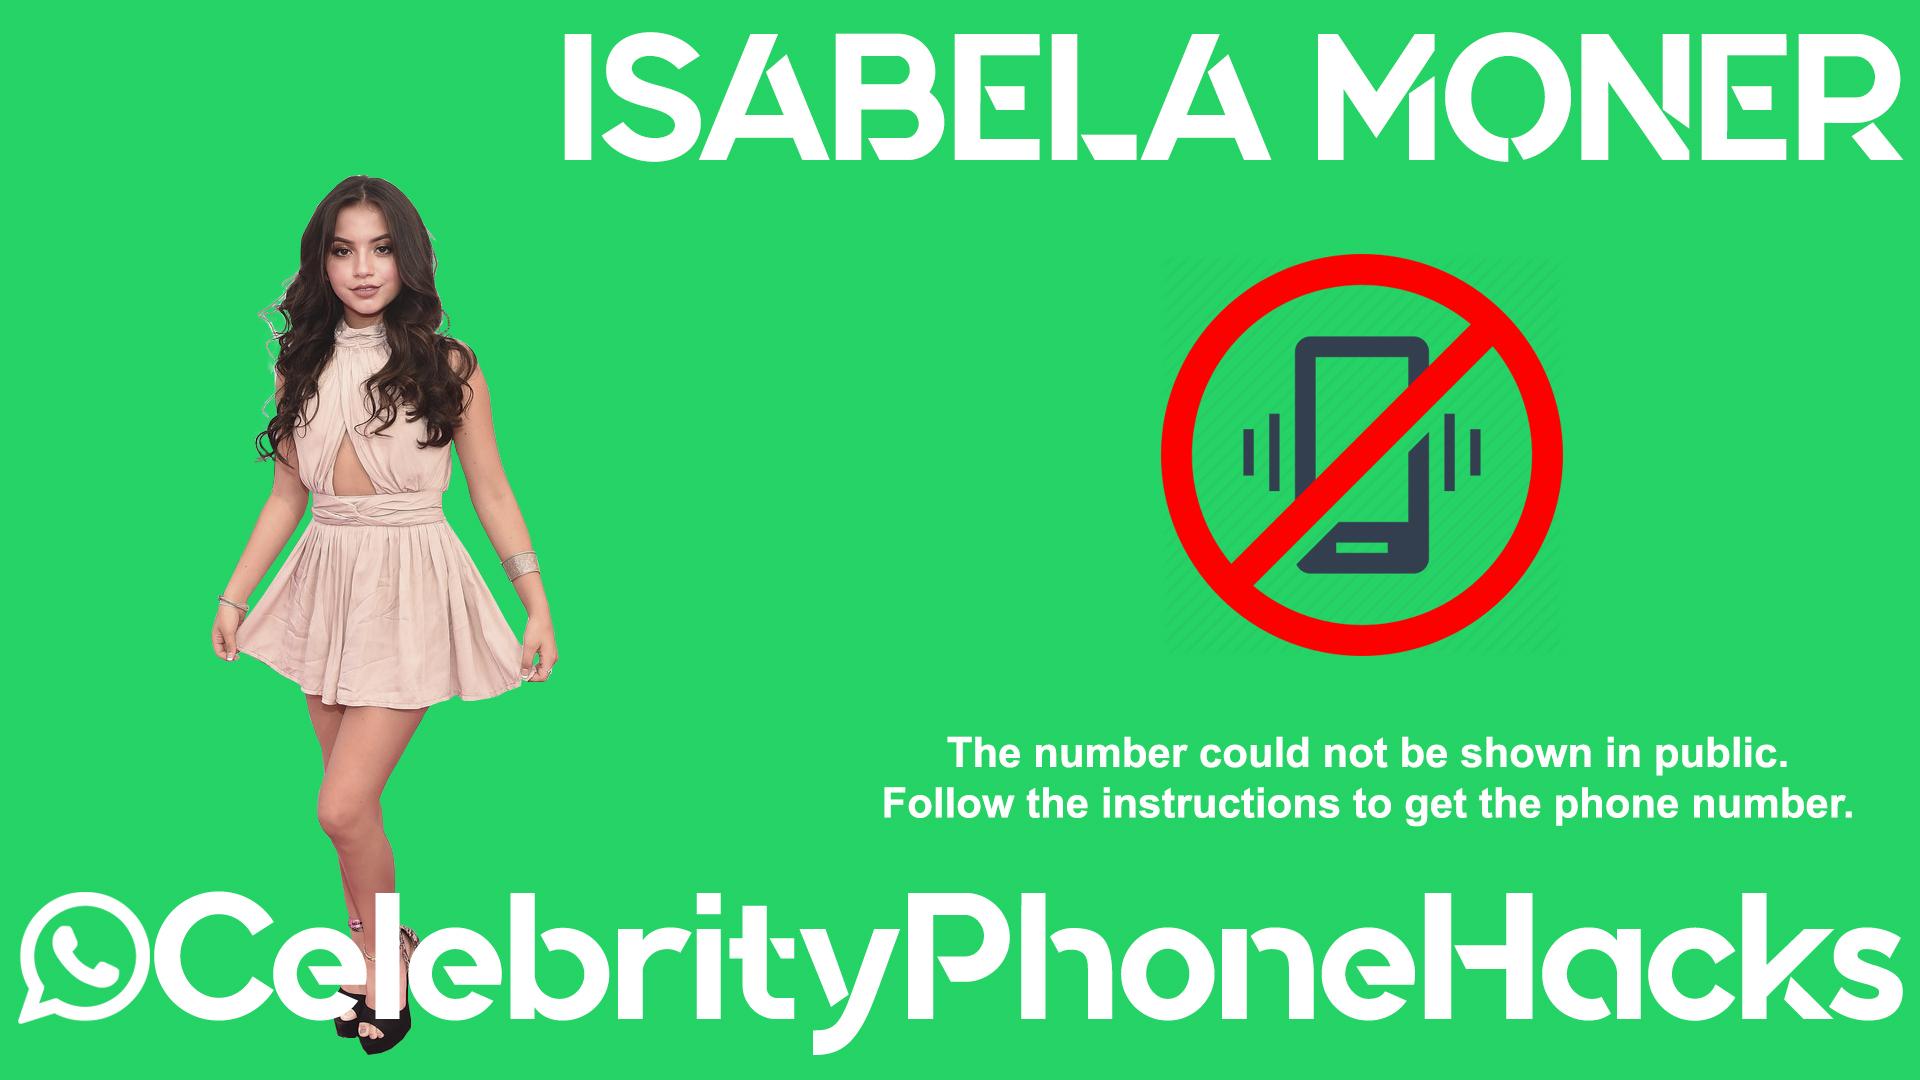 Isabela Moner real phone number 2019 whatsapp hacked leaked